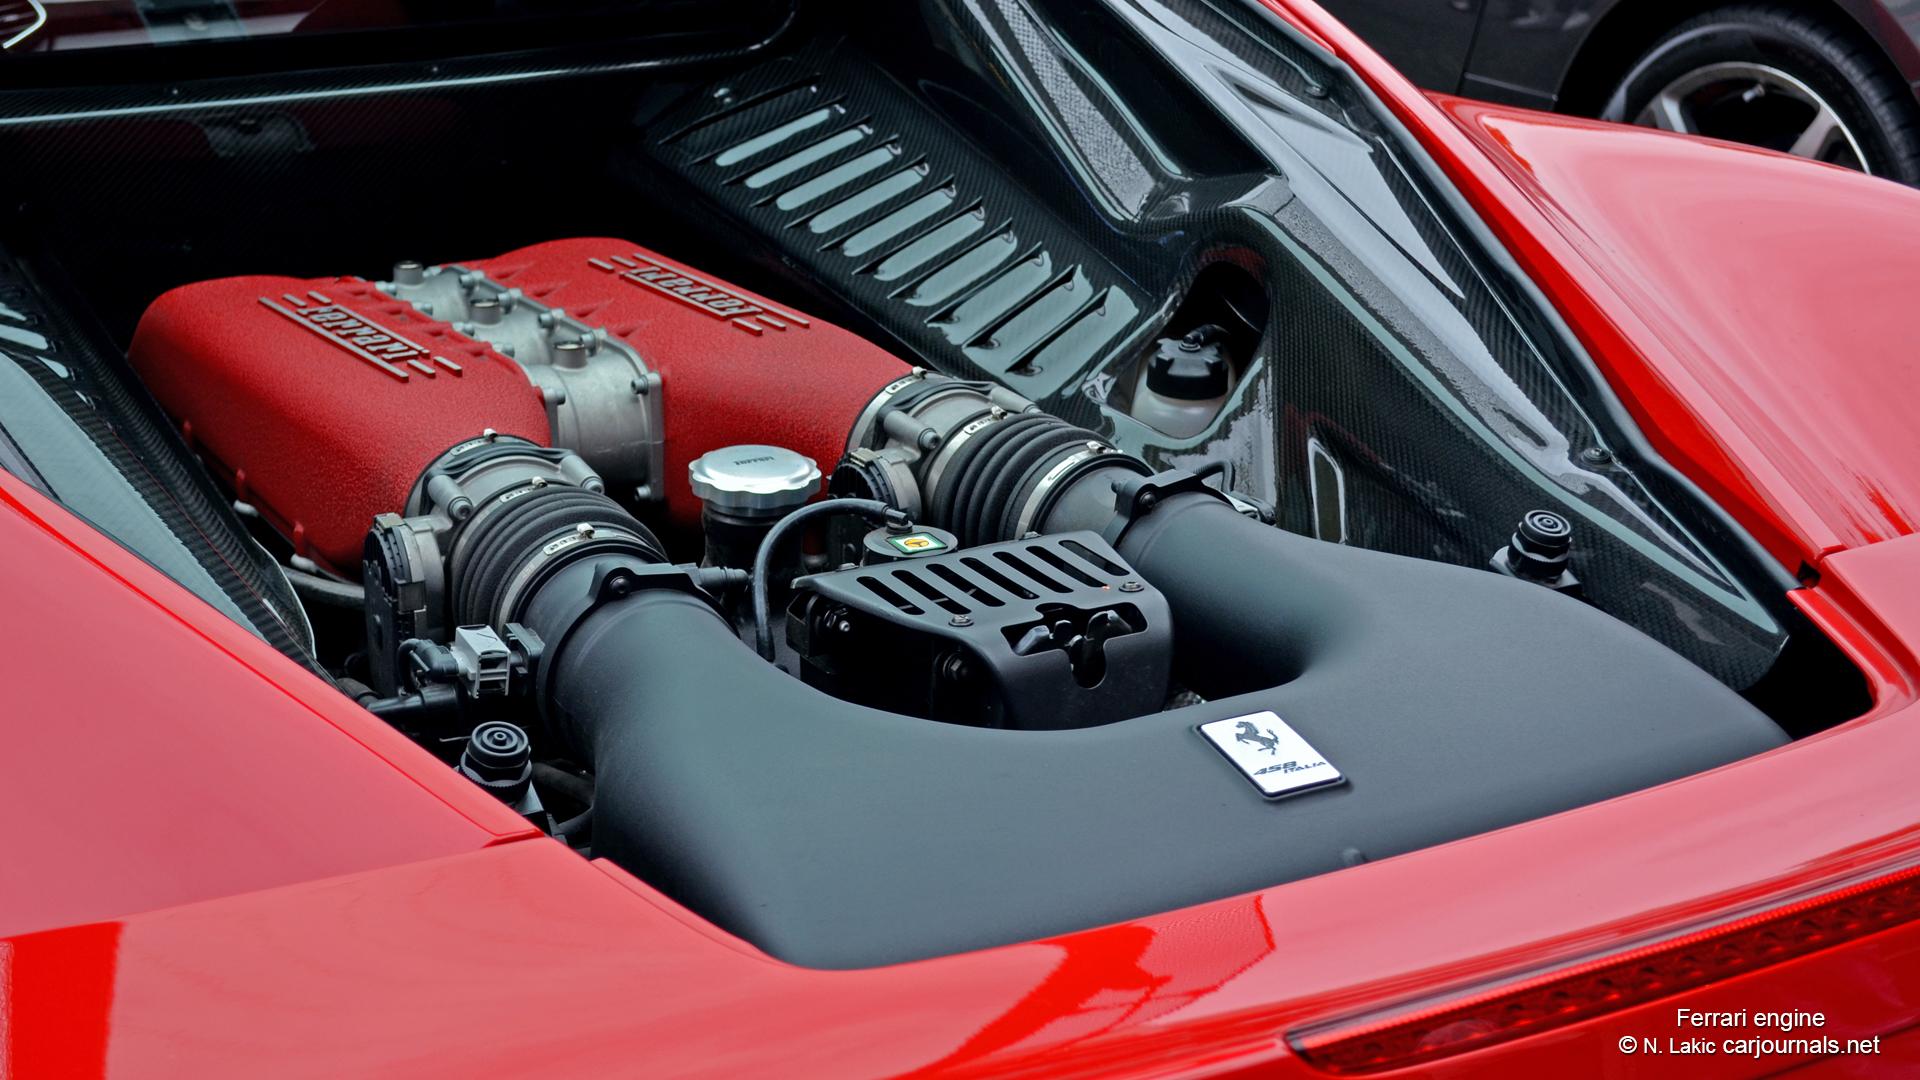 Hd Car Wallpapers Ferrari Engine Car Journals